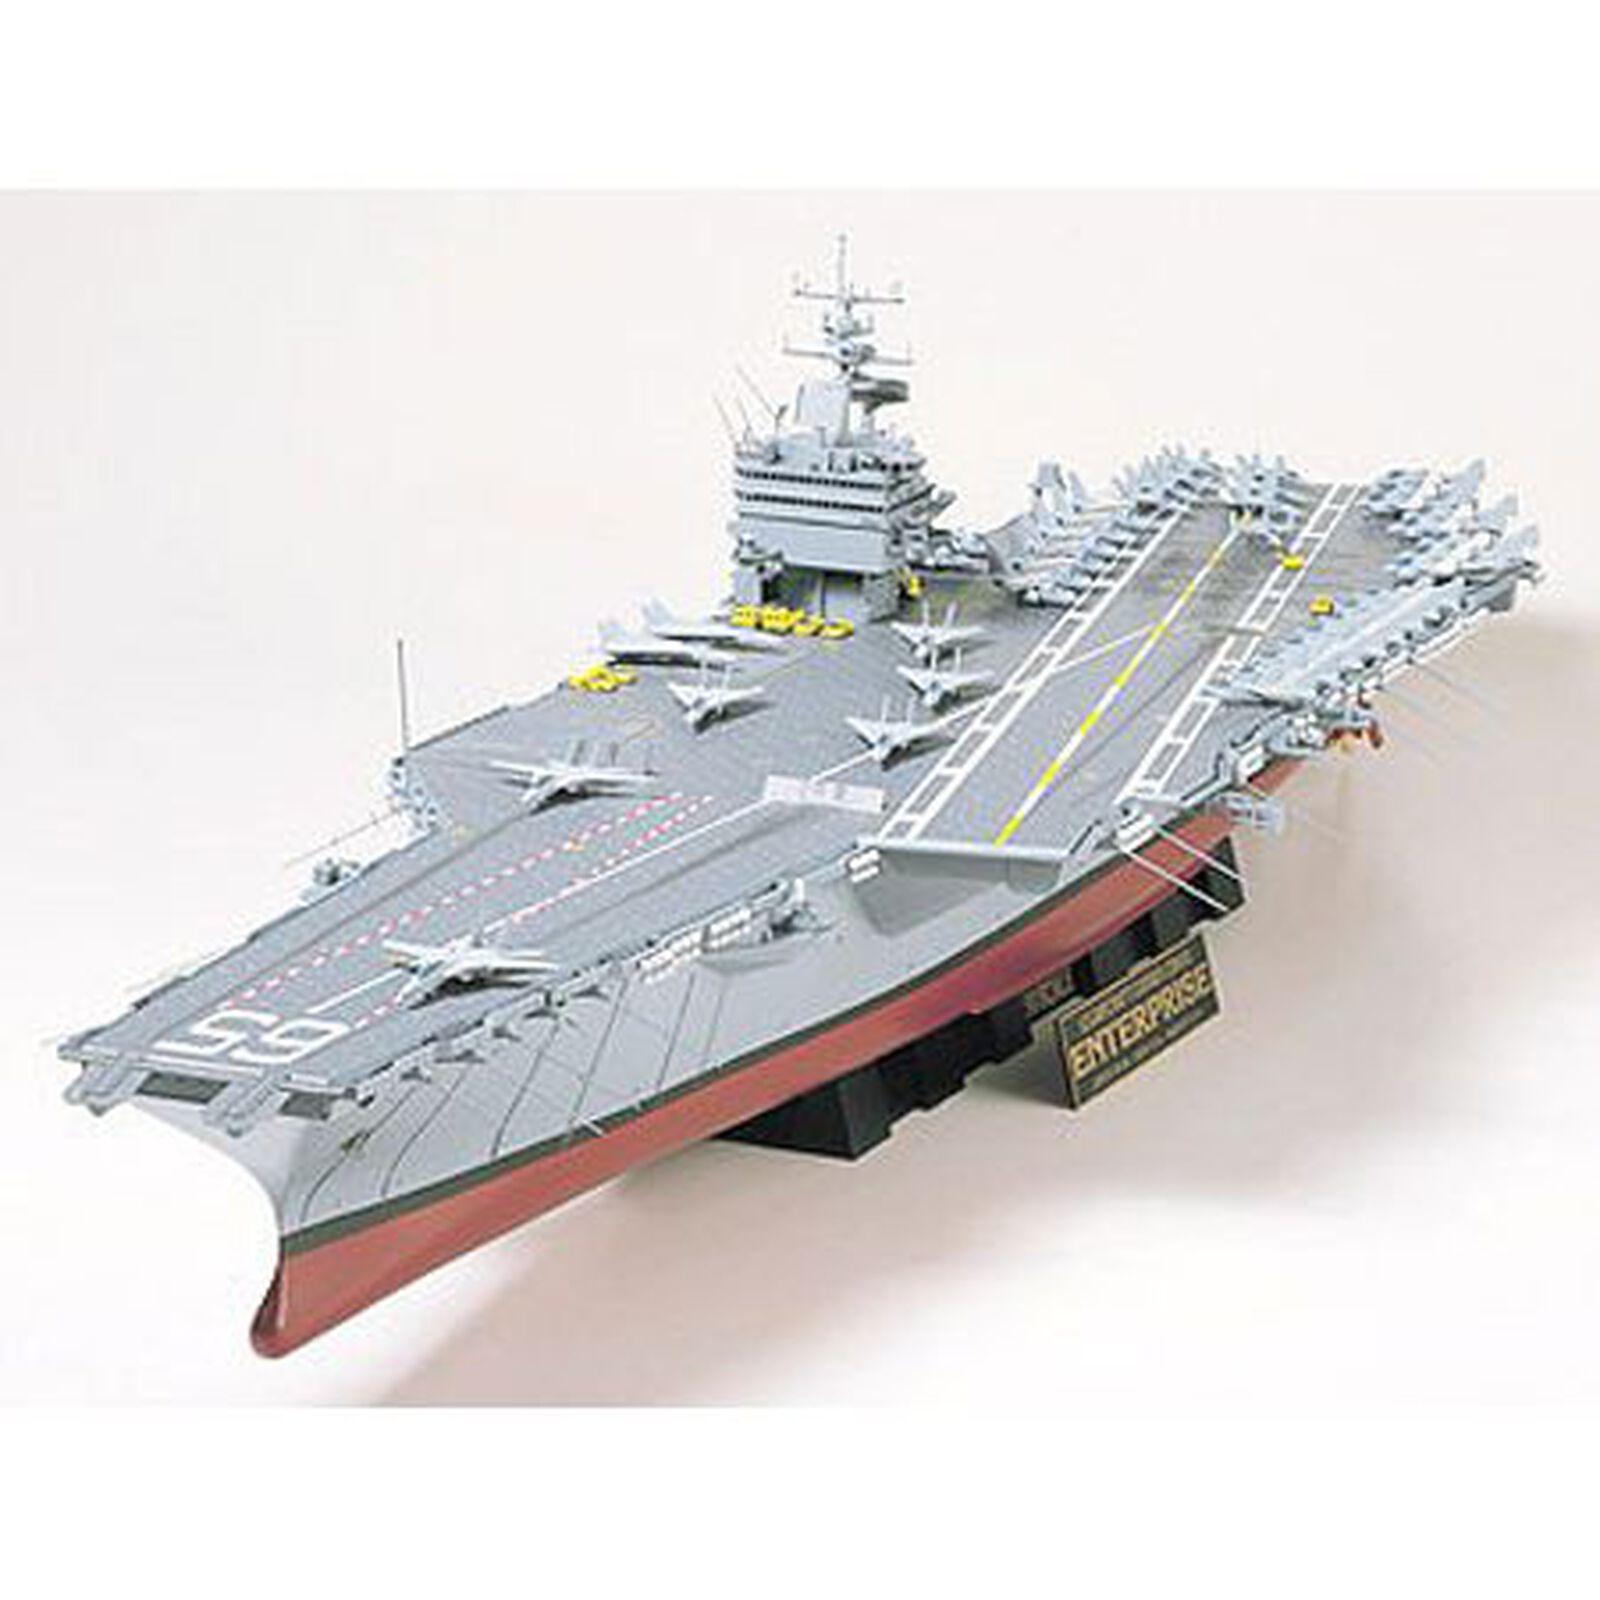 1/350 USS Enterprise Carrier